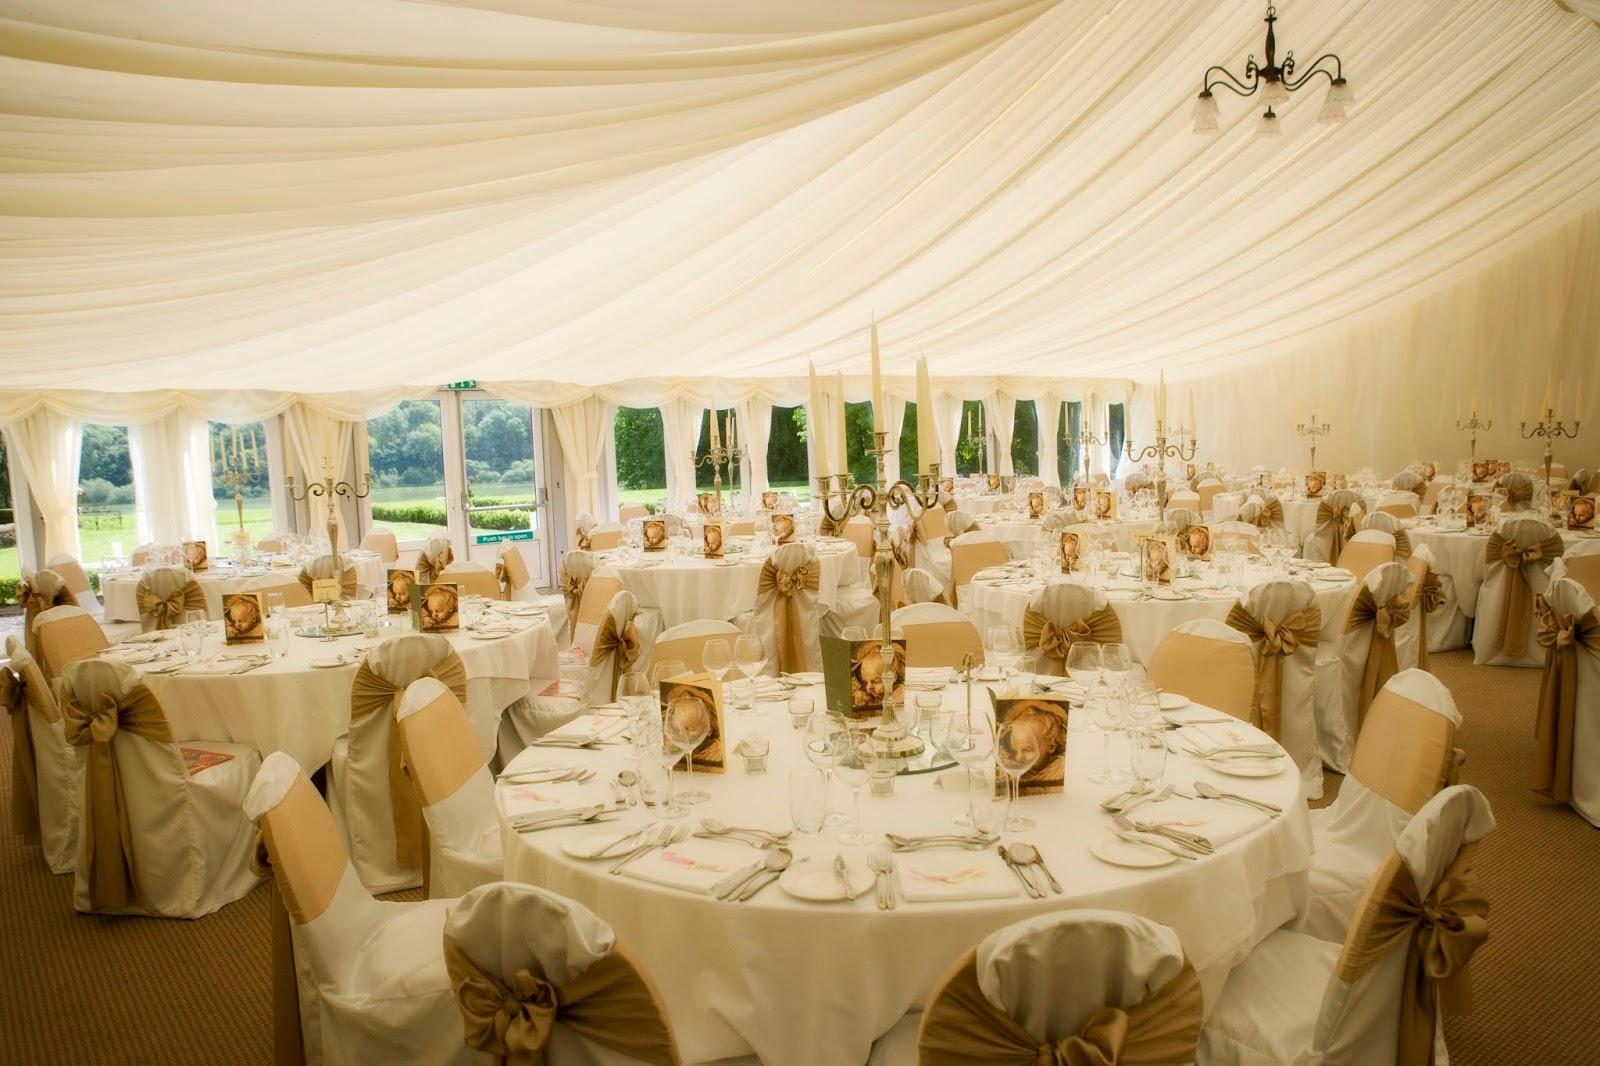 Irelands Blue Book Top 5 Trends In Wedding Themes